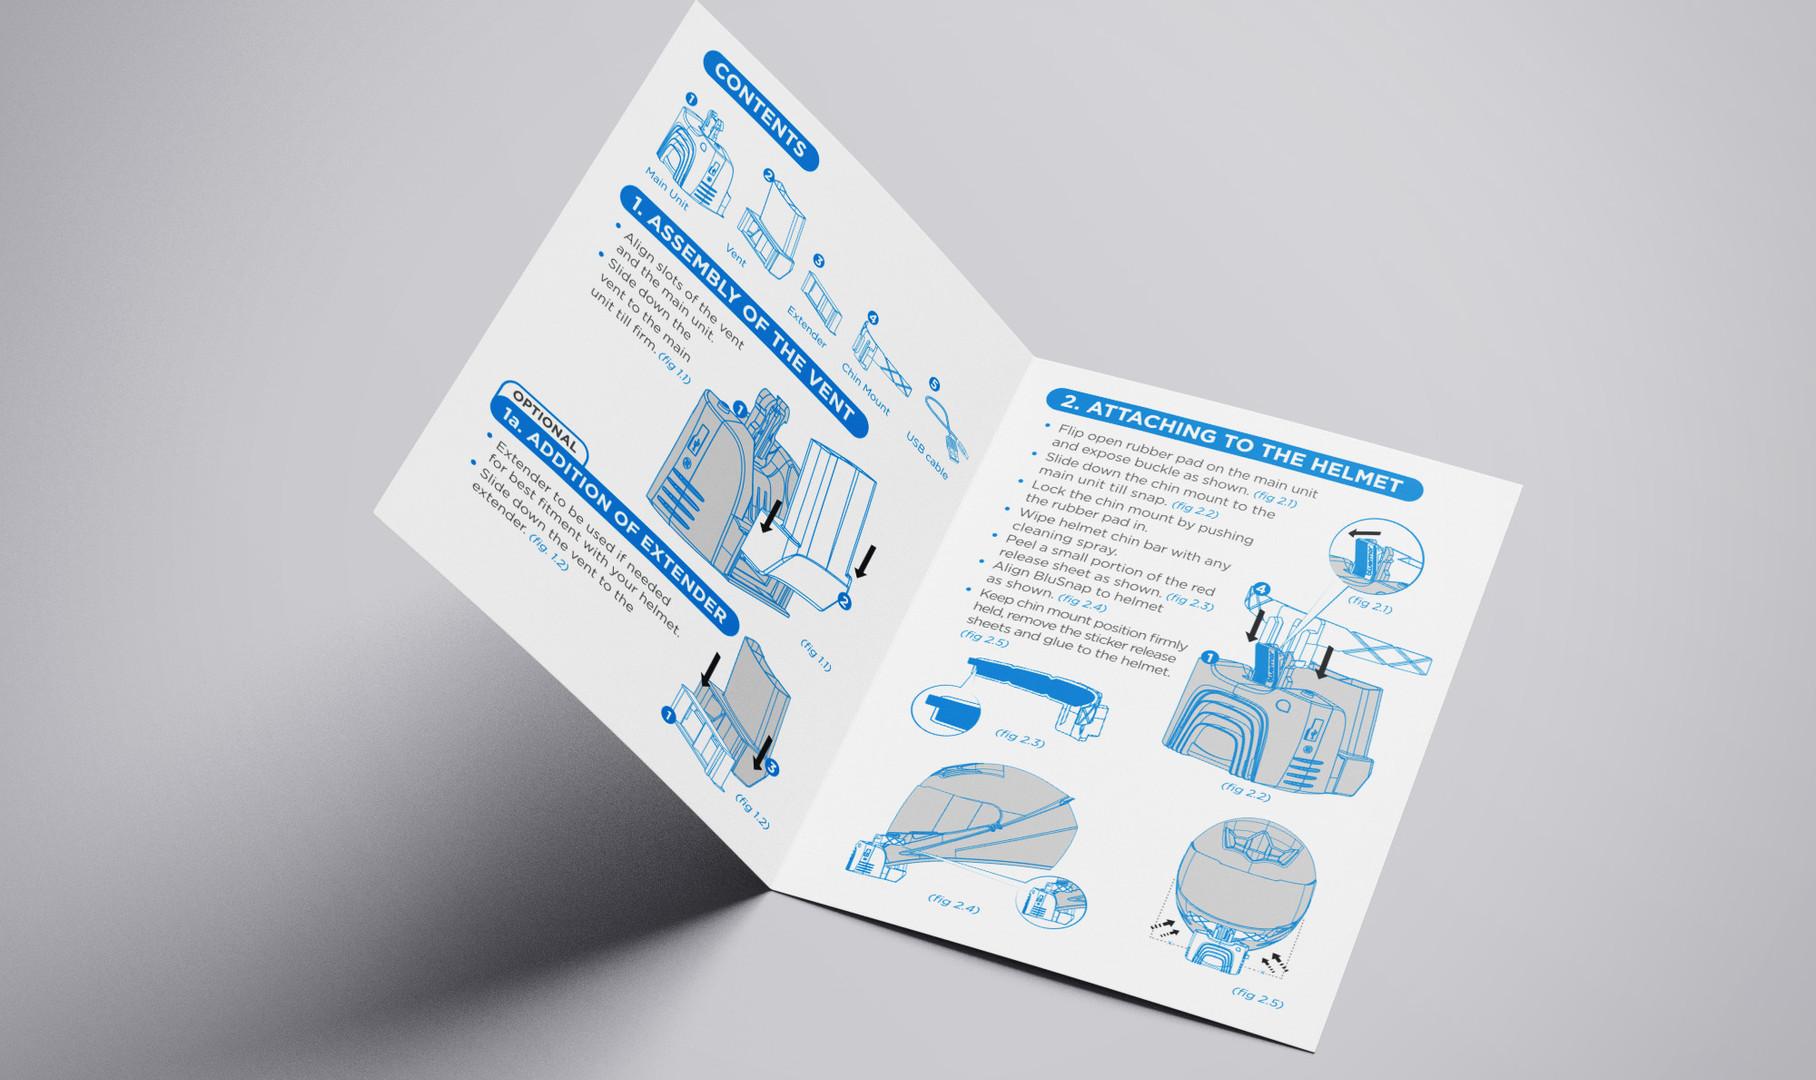 Blu Armour Product Manual